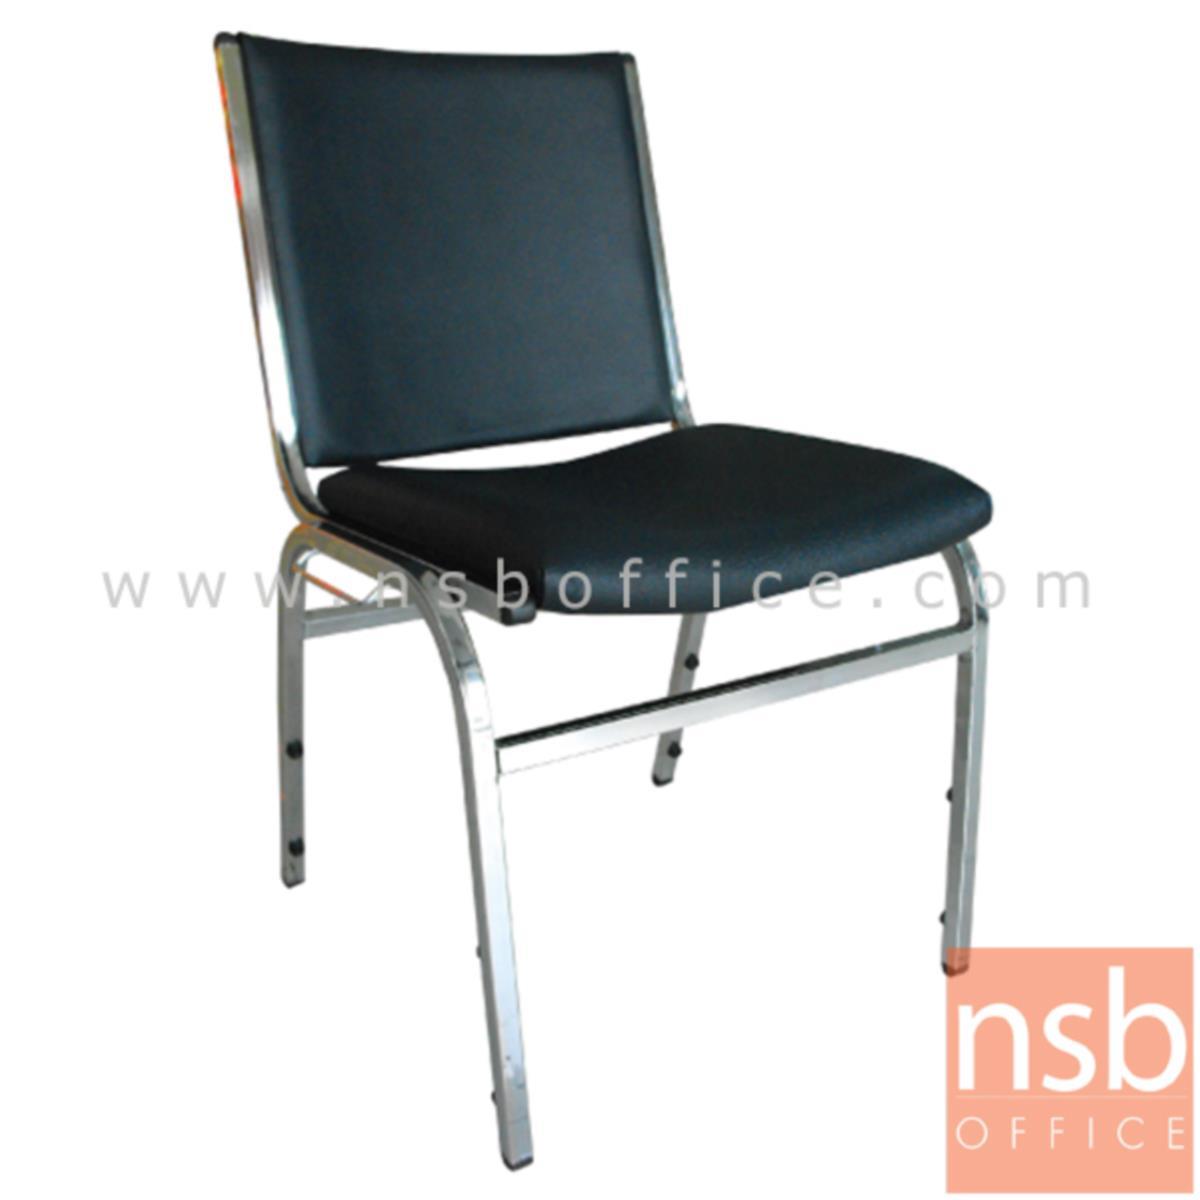 B05A123:เก้าอี้อเนกประสงค์ รุ่น Blonsky (บลอนสกี้)  ขาเหล็กชุบโครเมี่ยม